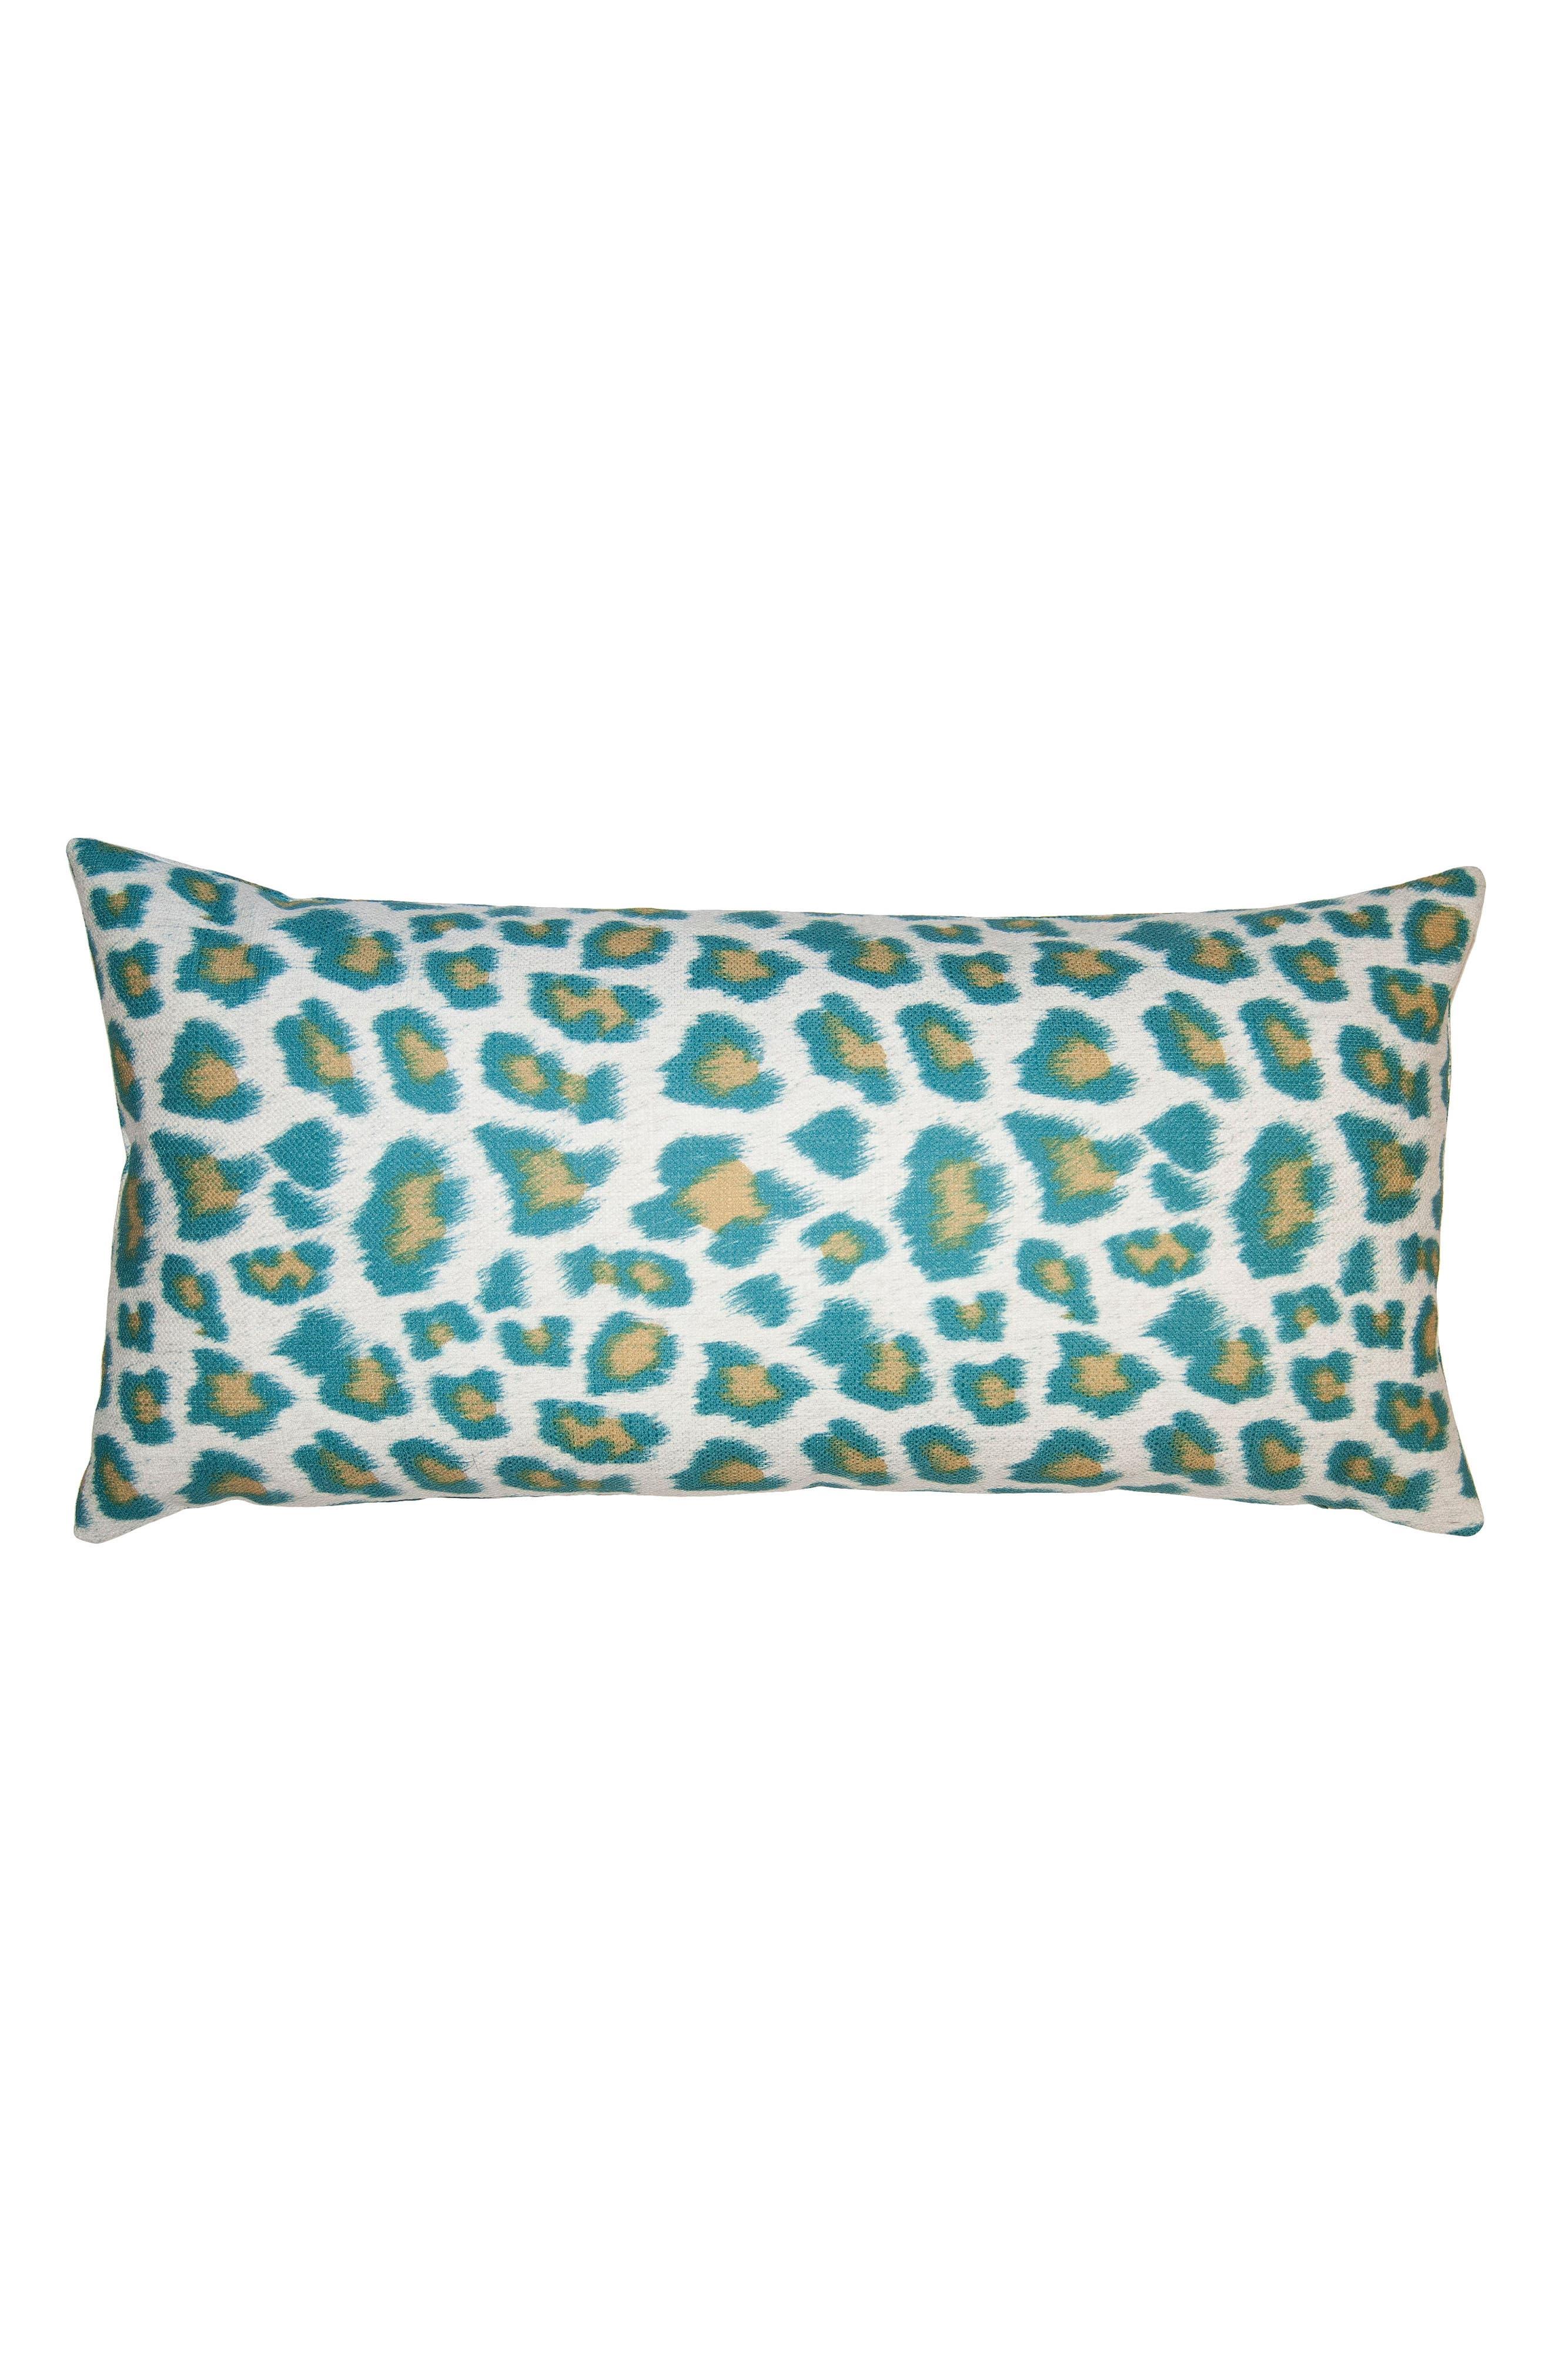 Riviera Cheetah Accent Pillow,                             Main thumbnail 1, color,                             Teal